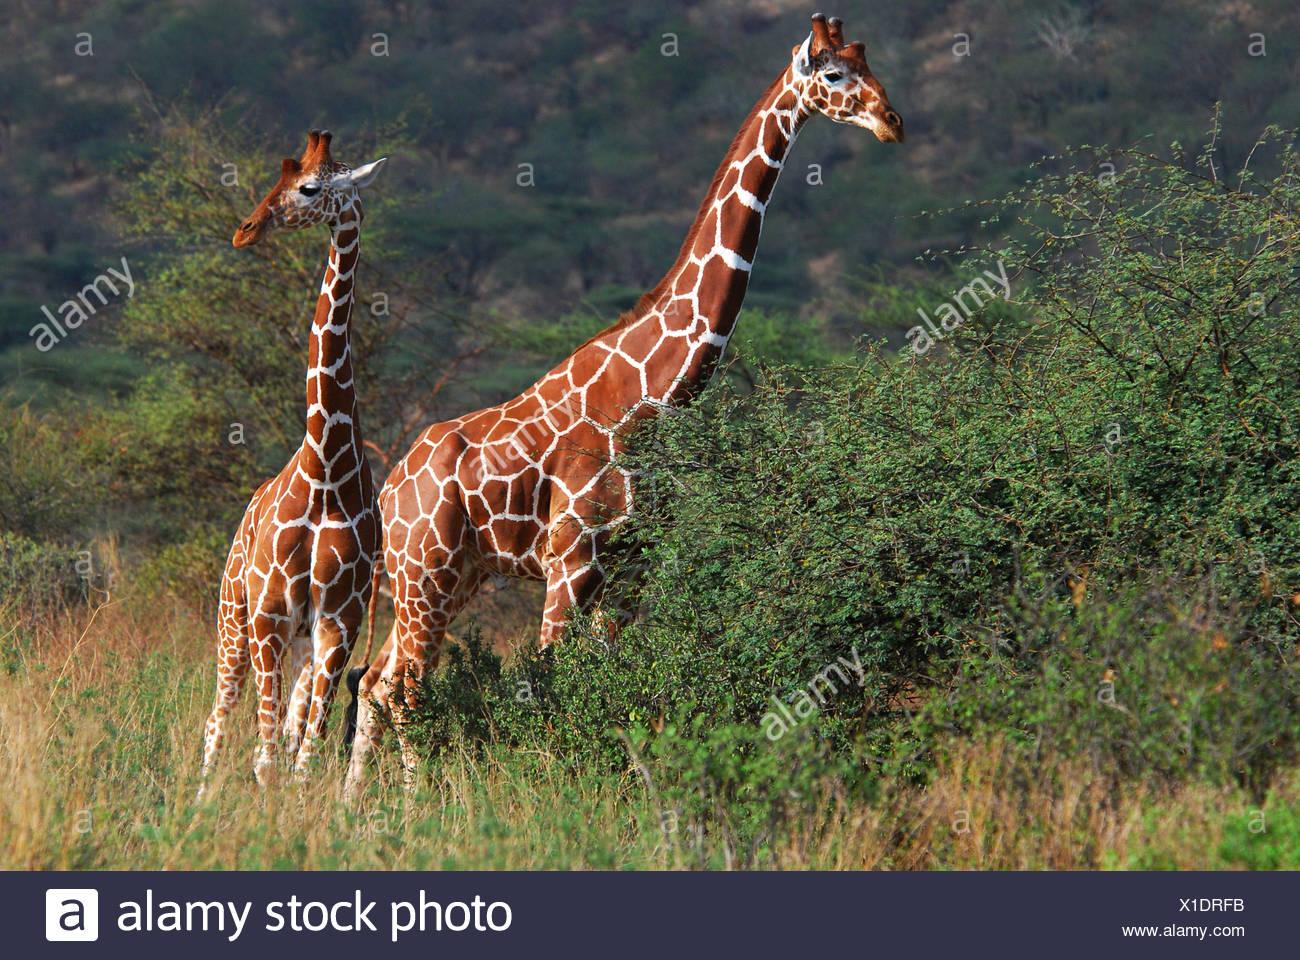 Somali Girafe (Giraffa camelopardalis reticulata) Parc national de Samburu, Kenya, Africa Banque D'Images